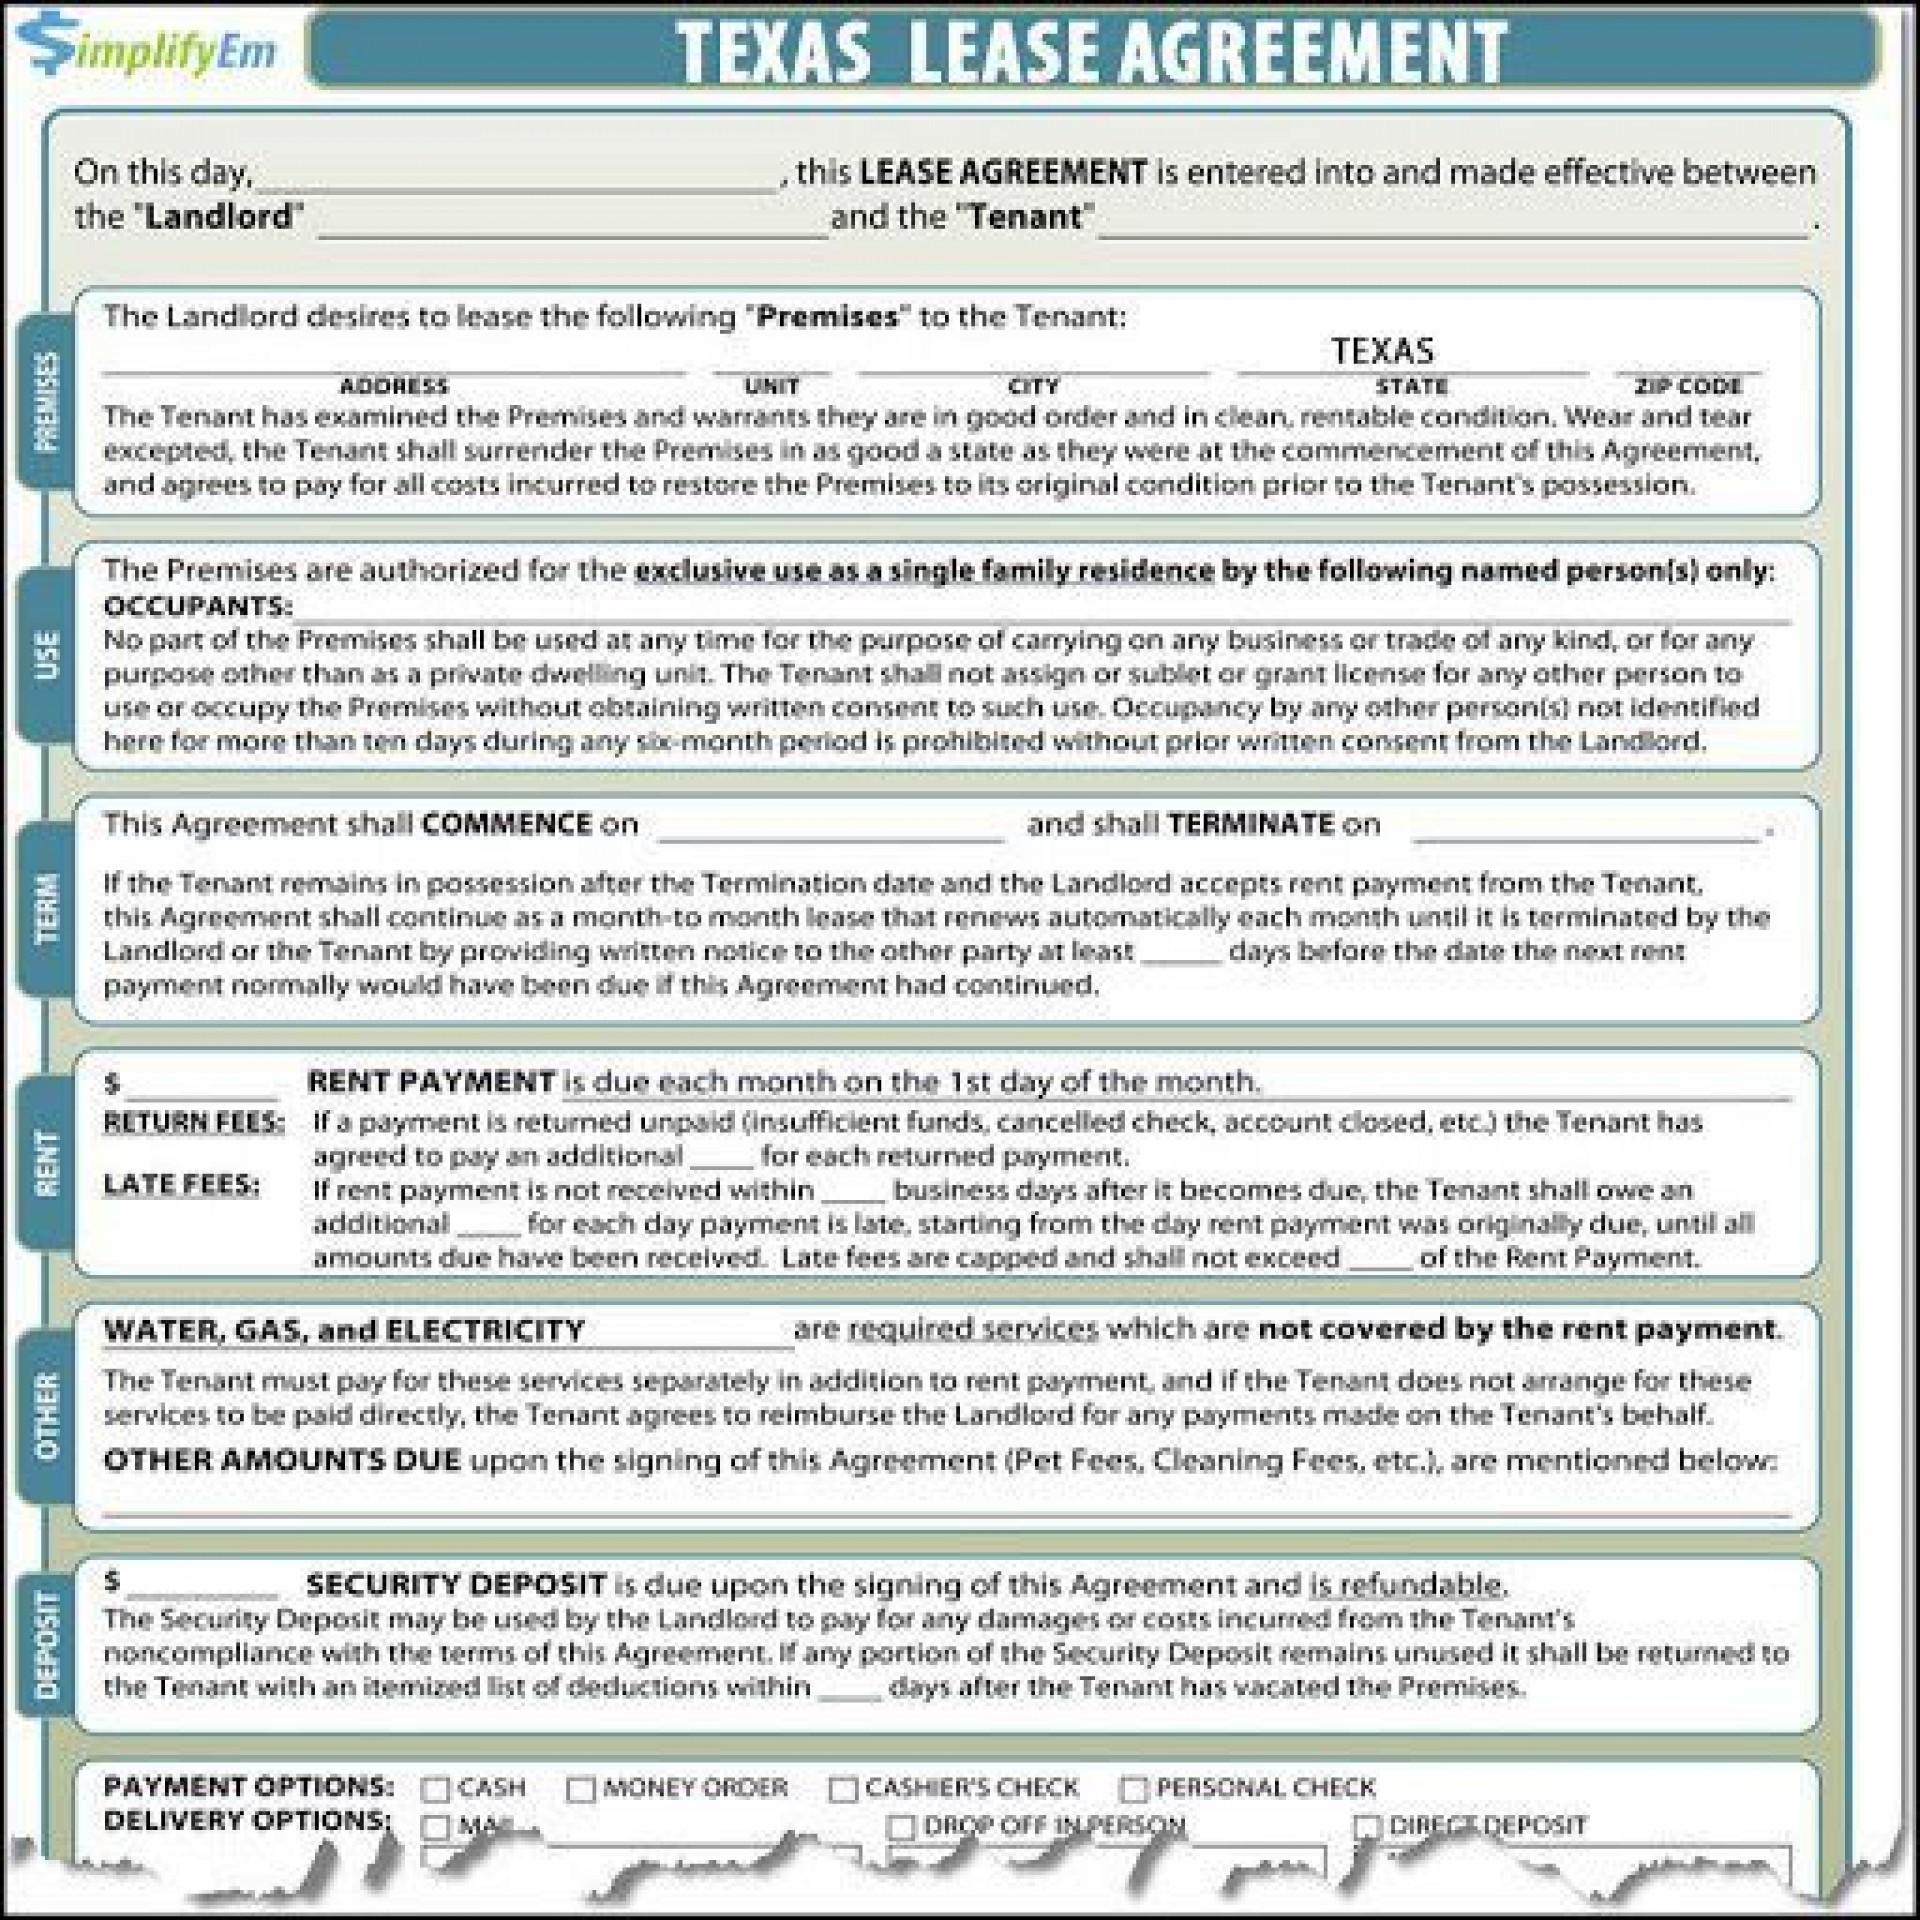 000 Imposing Apartment Lease Agreement Form Texa Photo 1920